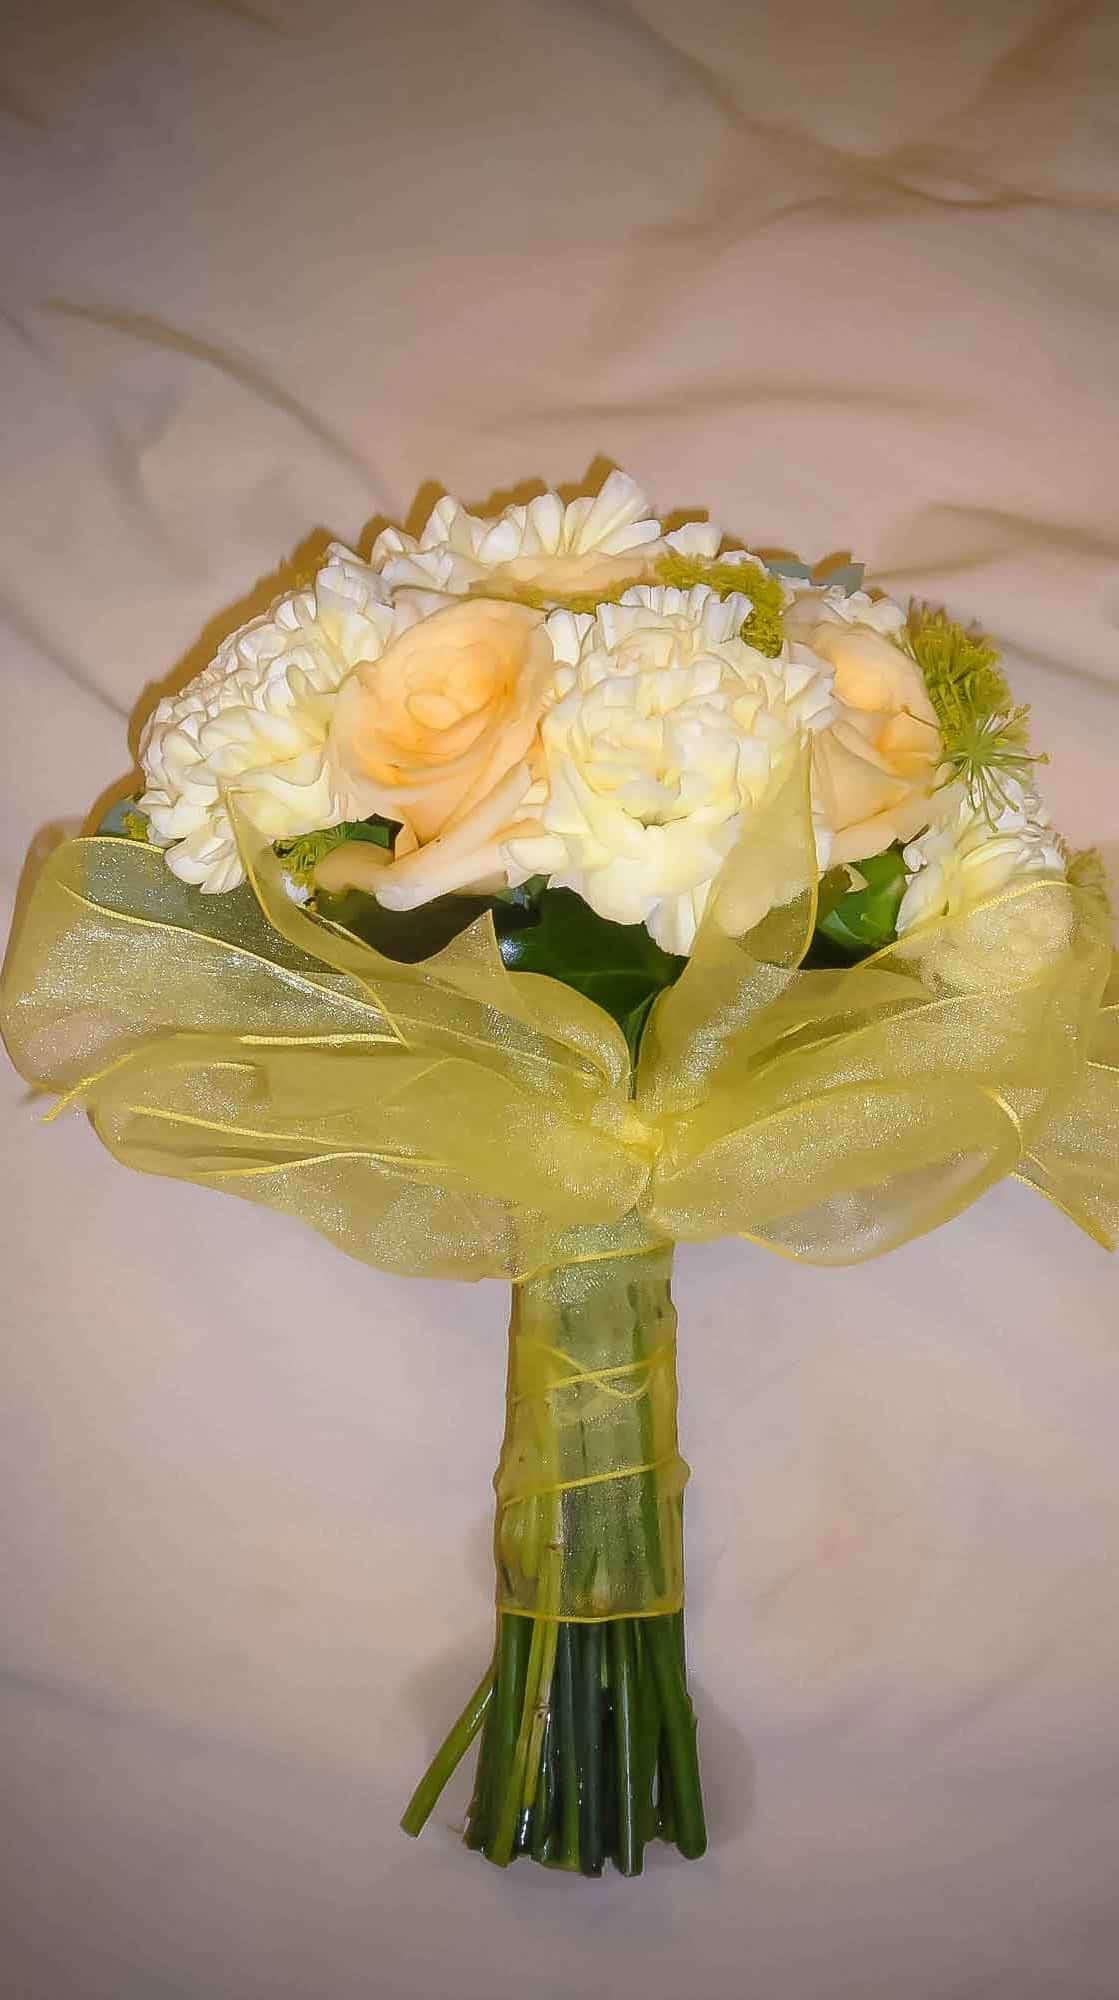 Rosebuds_flowers_torquay_hand_7